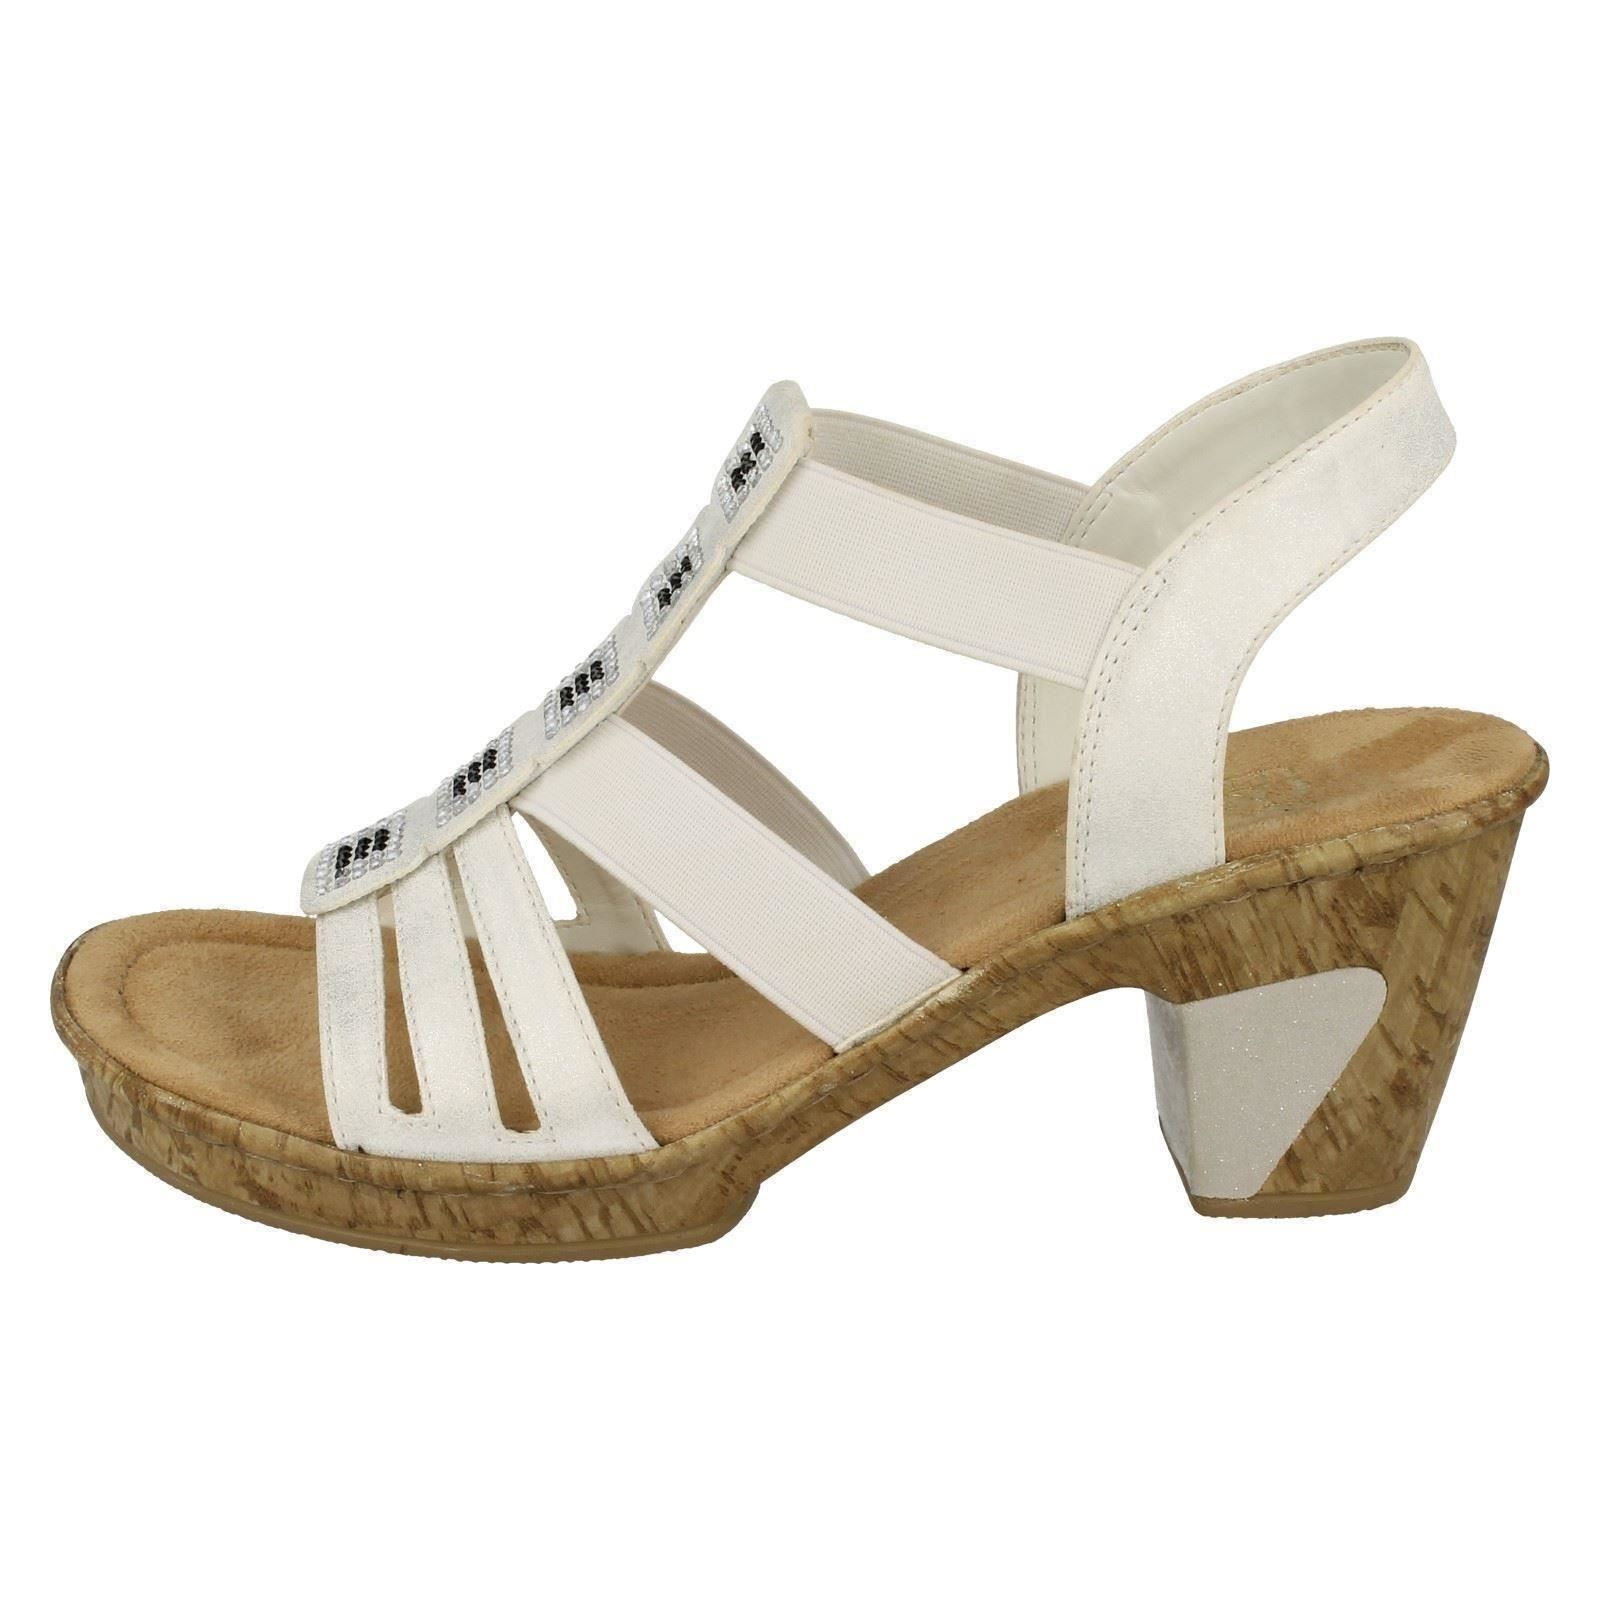 6f9e62fc81a76 Ladies-Rieker-Heeled-Sandals-039-69761-039 thumbnail 3